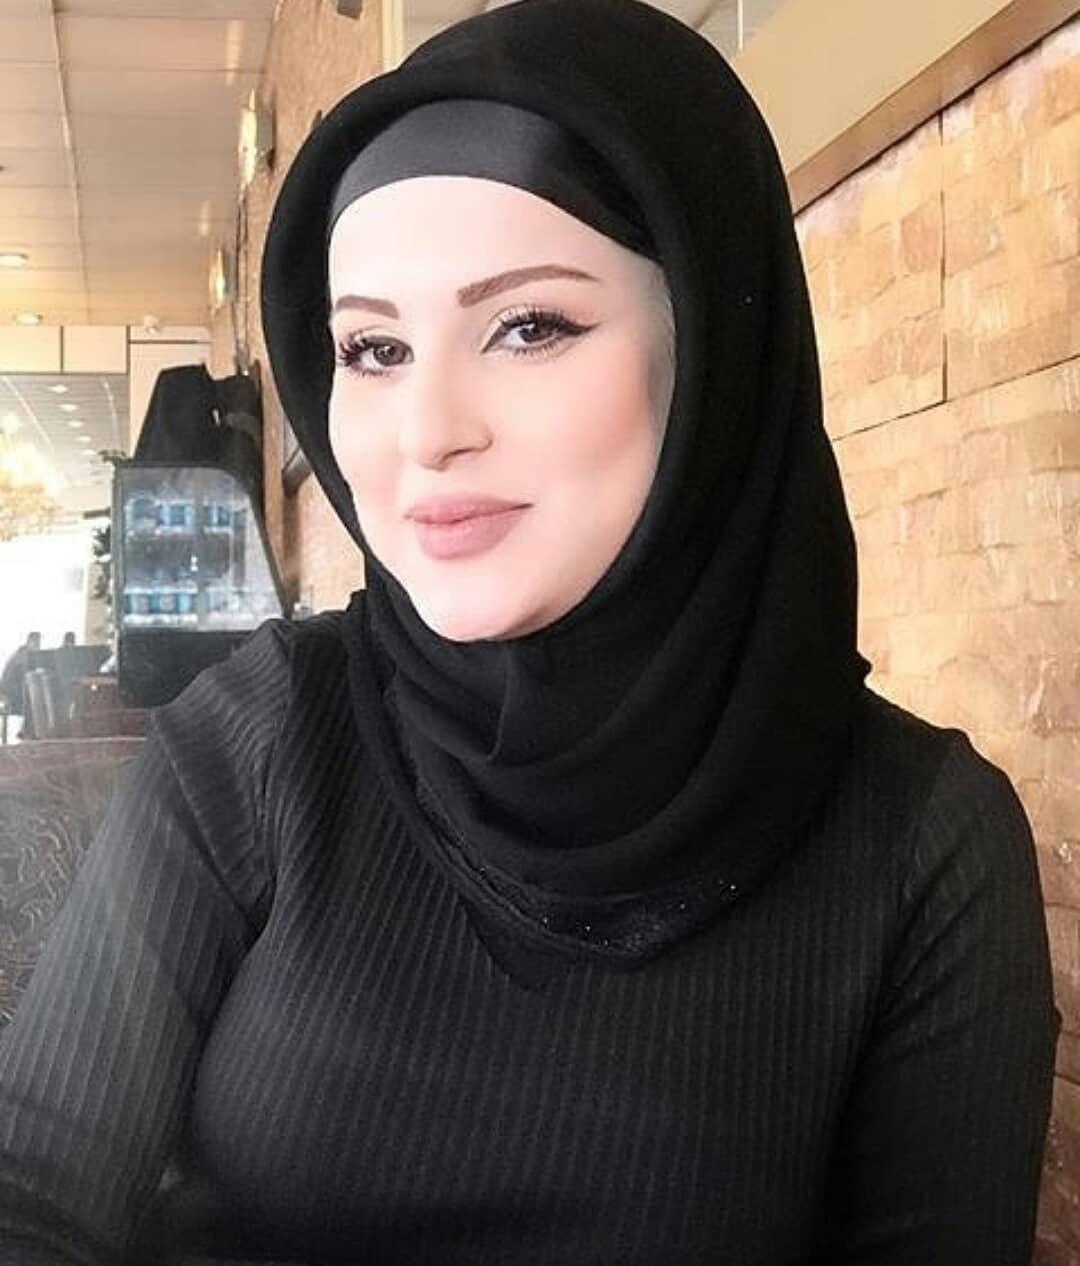 بالصور اجمل بنات محجبات بدون مكياج , صور لبنات من كل البلاد بالحجاب 1666 7